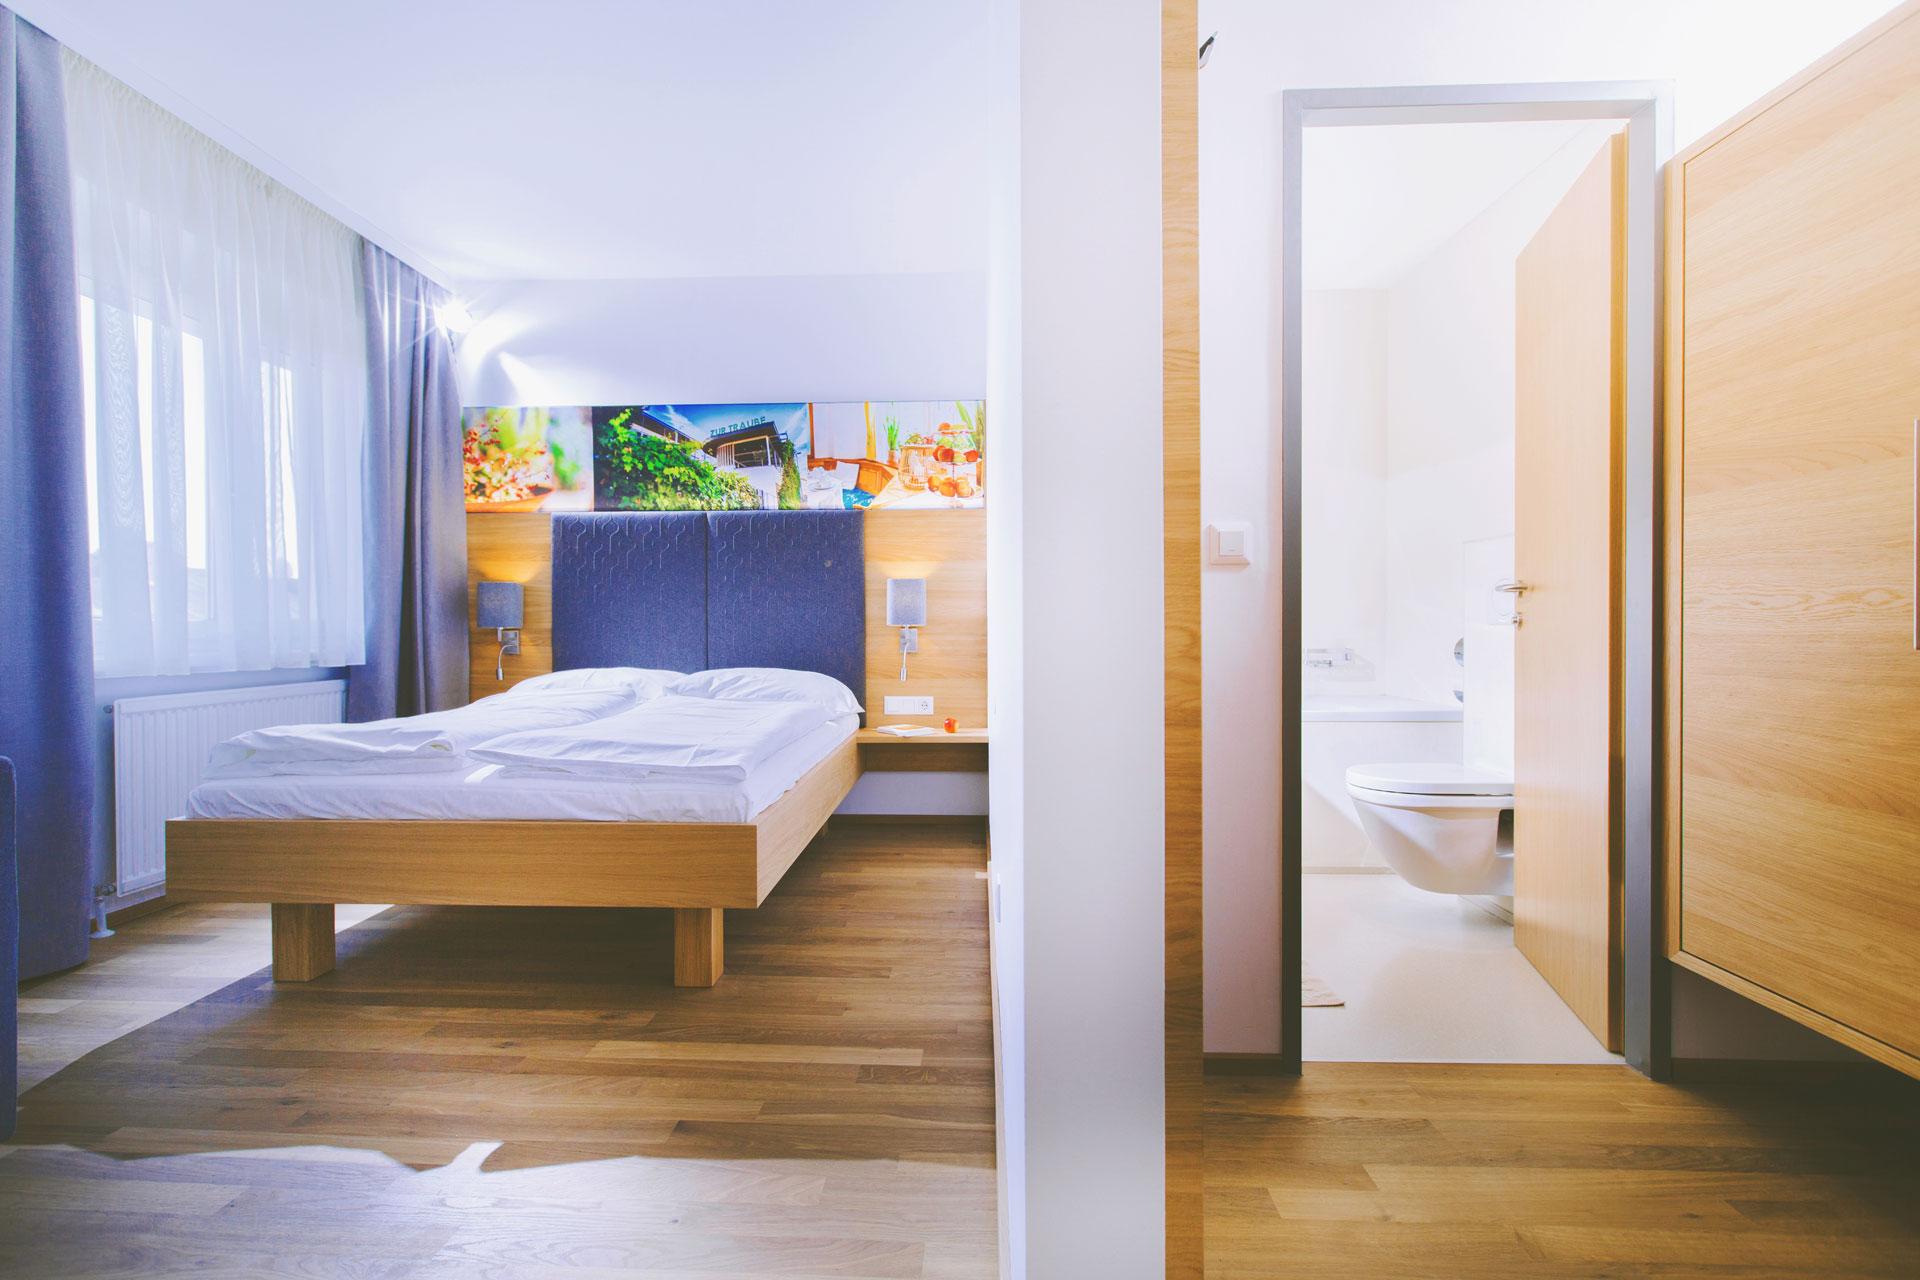 gasthof-zur-traube-doppelzimmer13